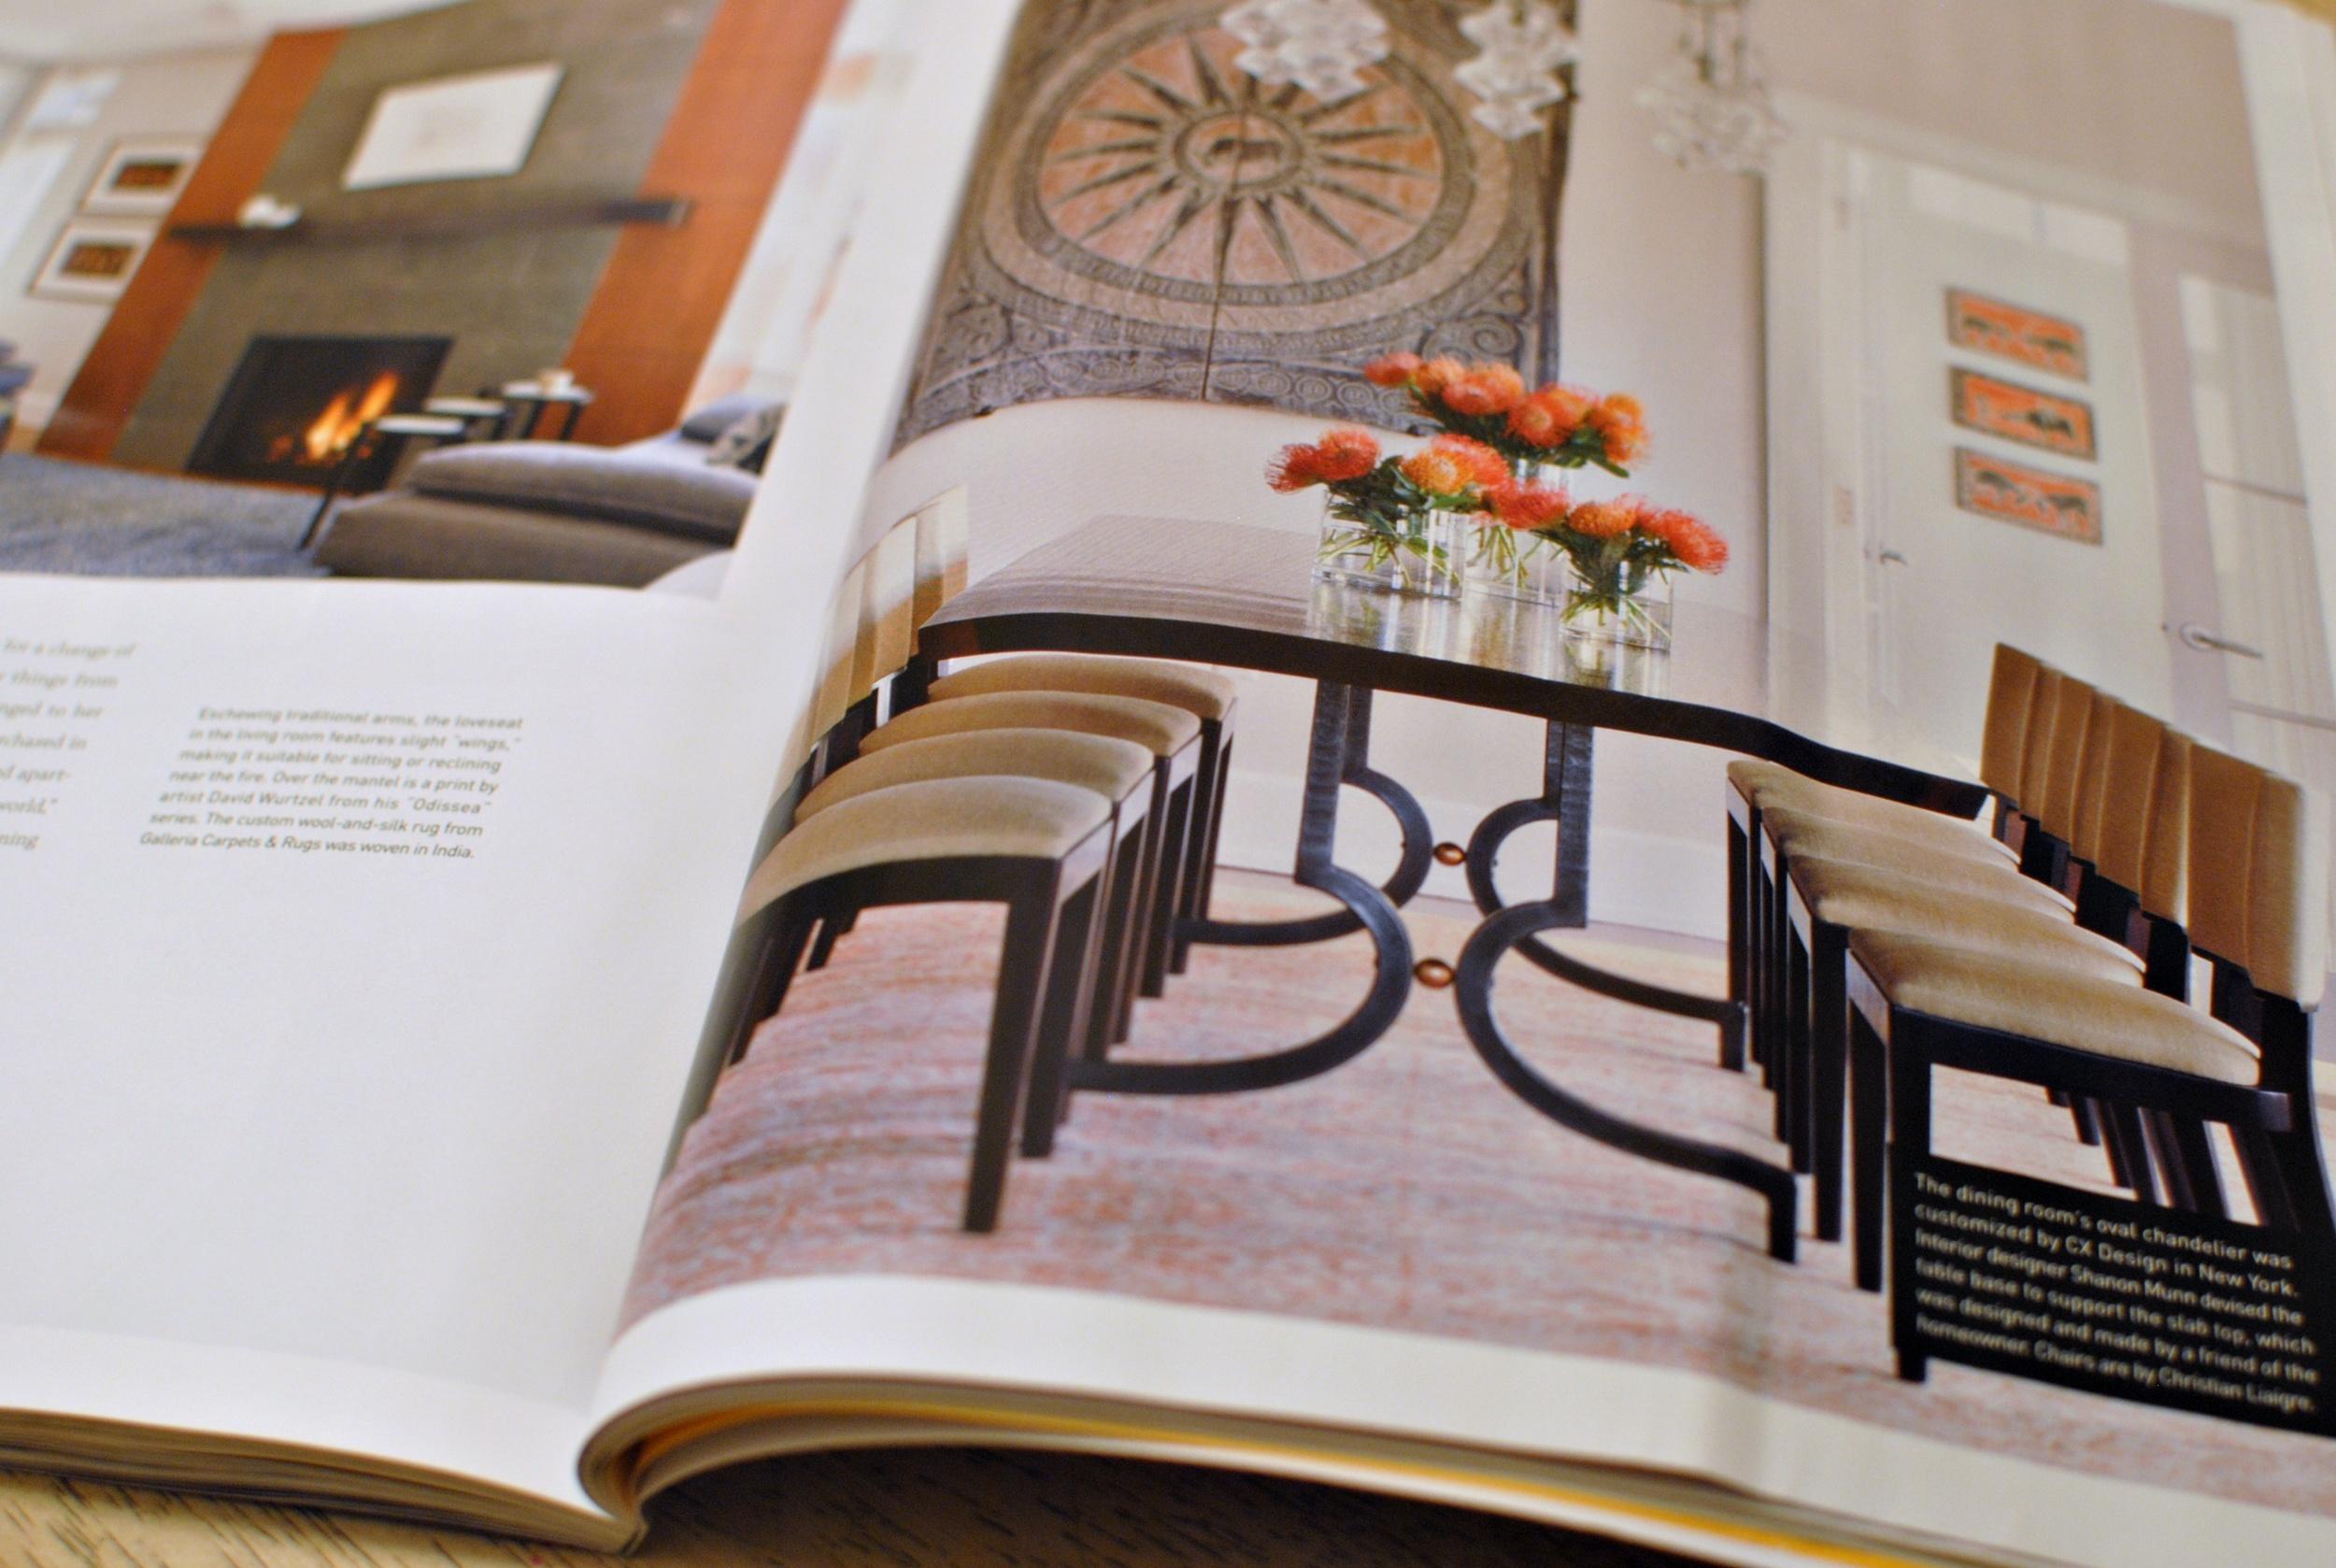 Luxe-magazine-table